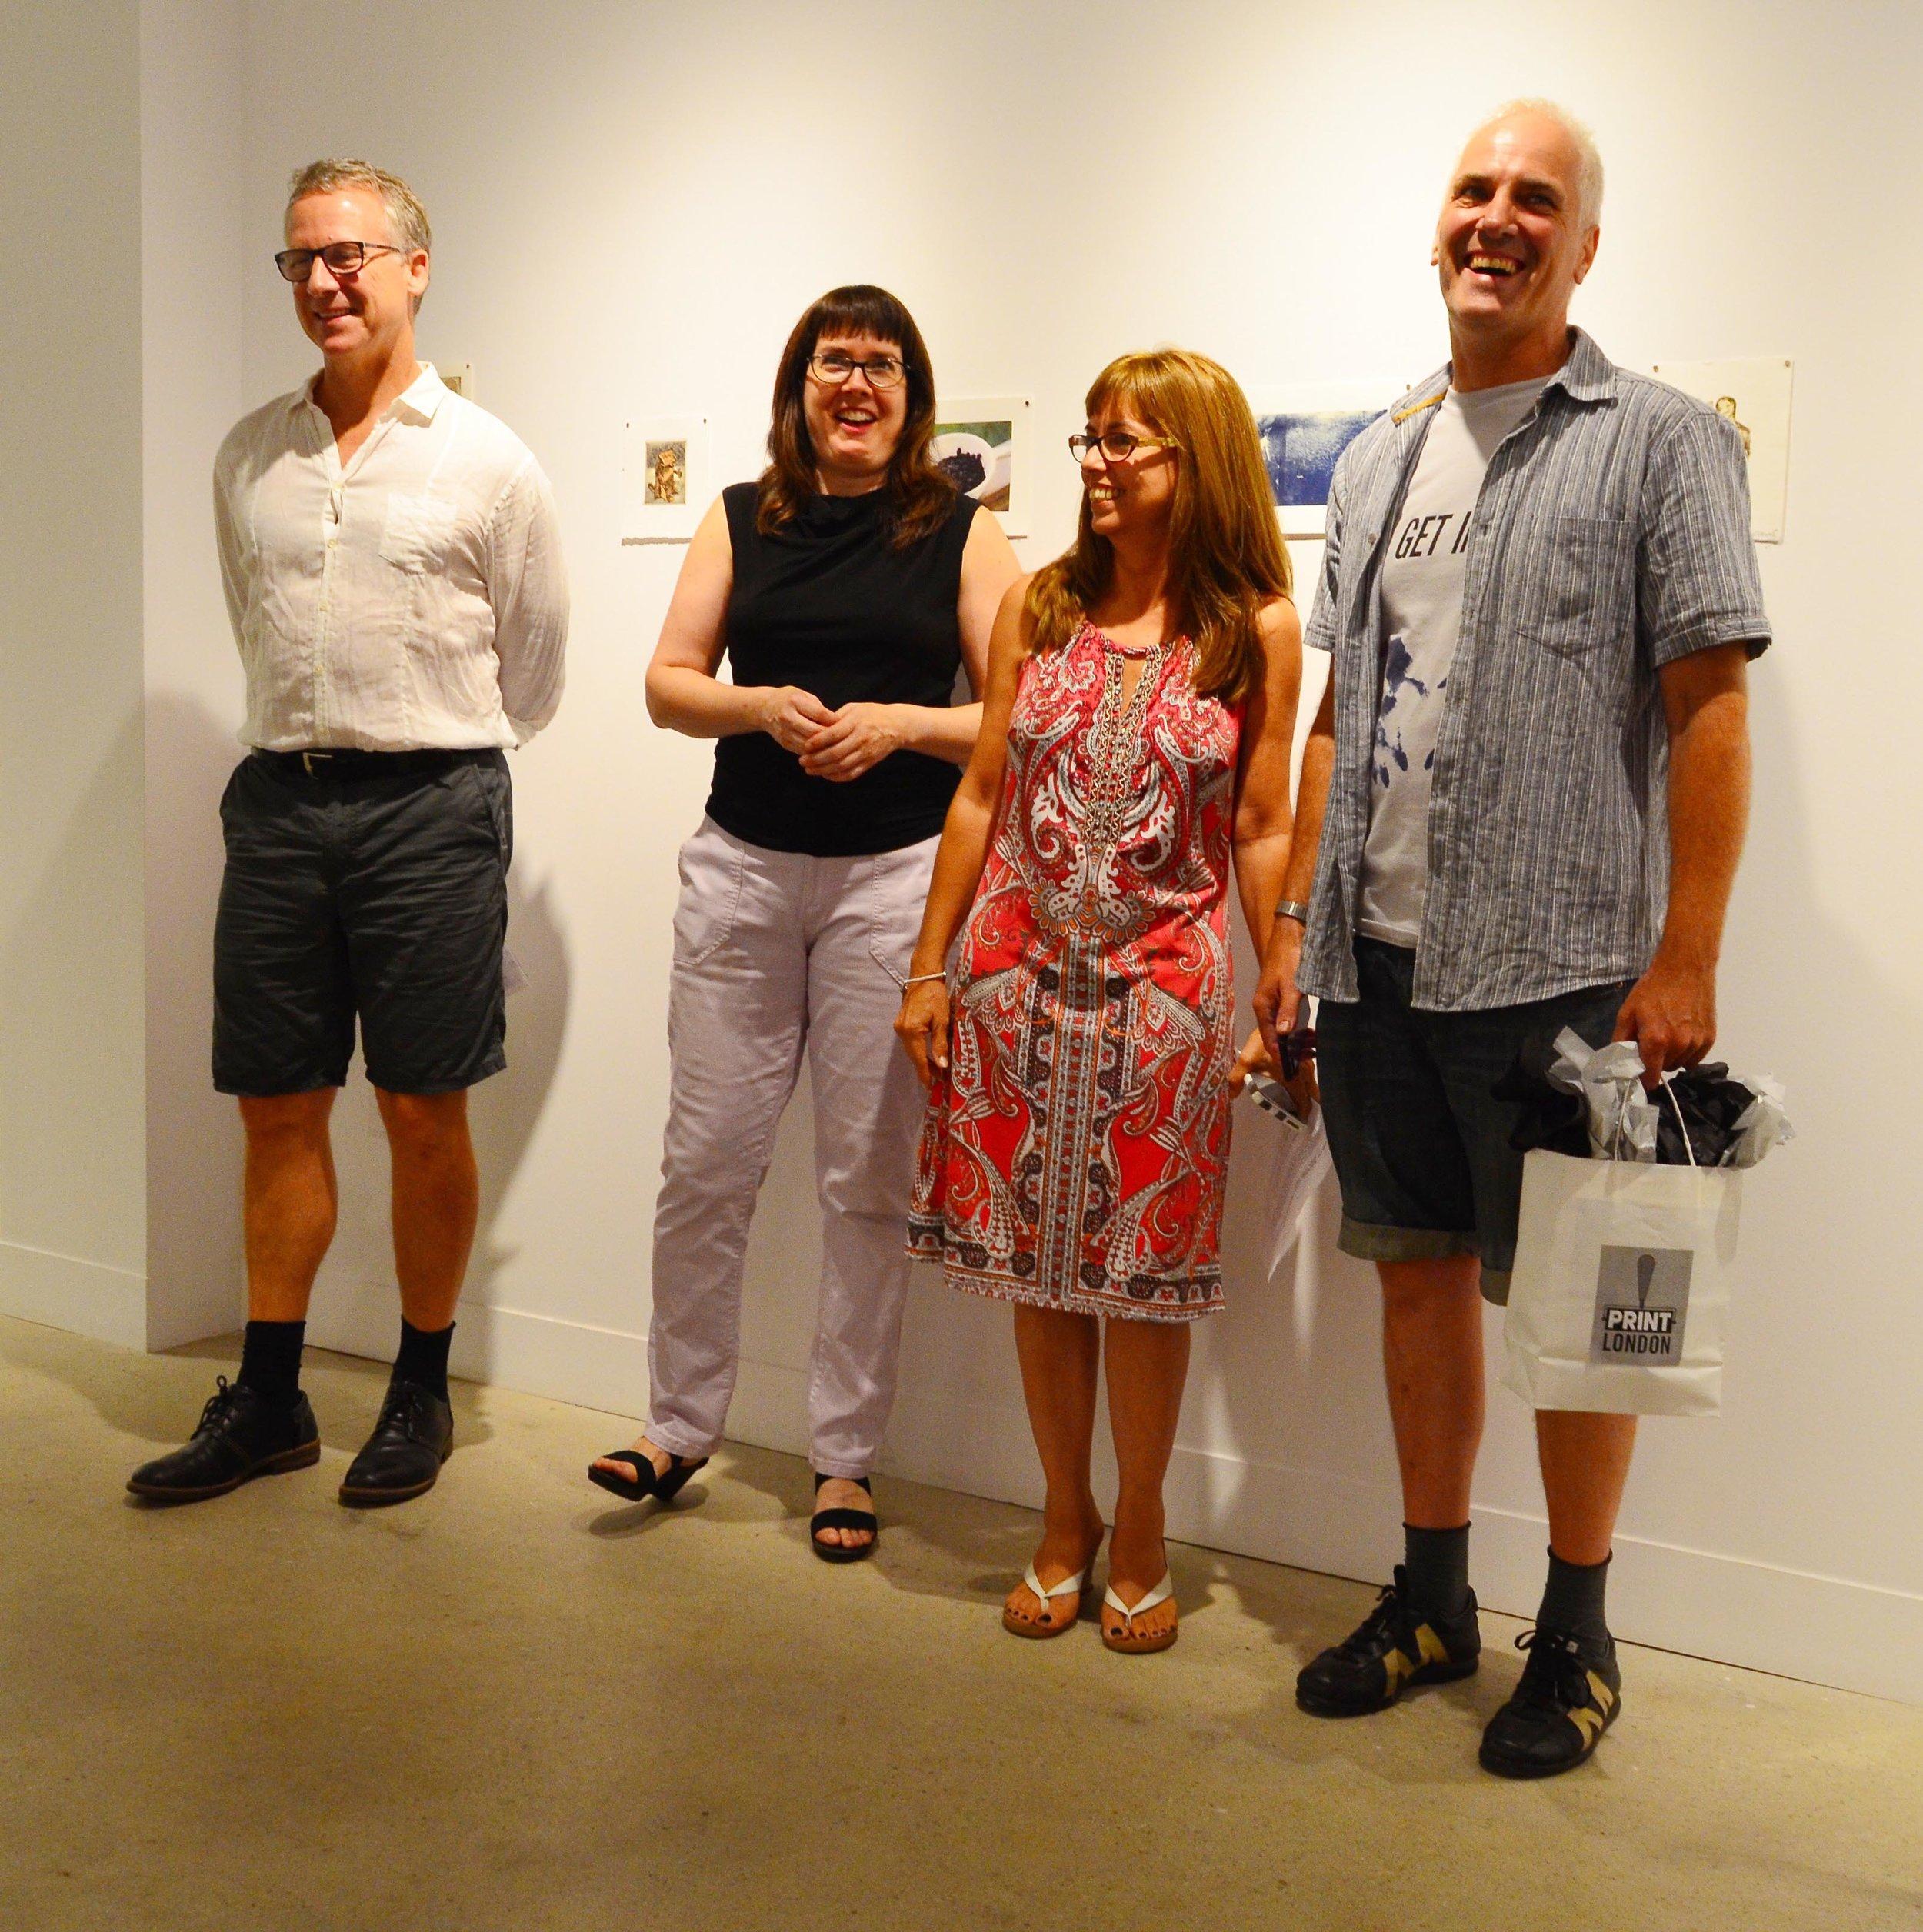 Left to Right:Patrick Mahon (juror), Cassandra Getty (juror), Joscelyn Gardner (Print London founder), Kurt Pammer (first prize artist), absent from photo -Jenna Faye Powell (juror)